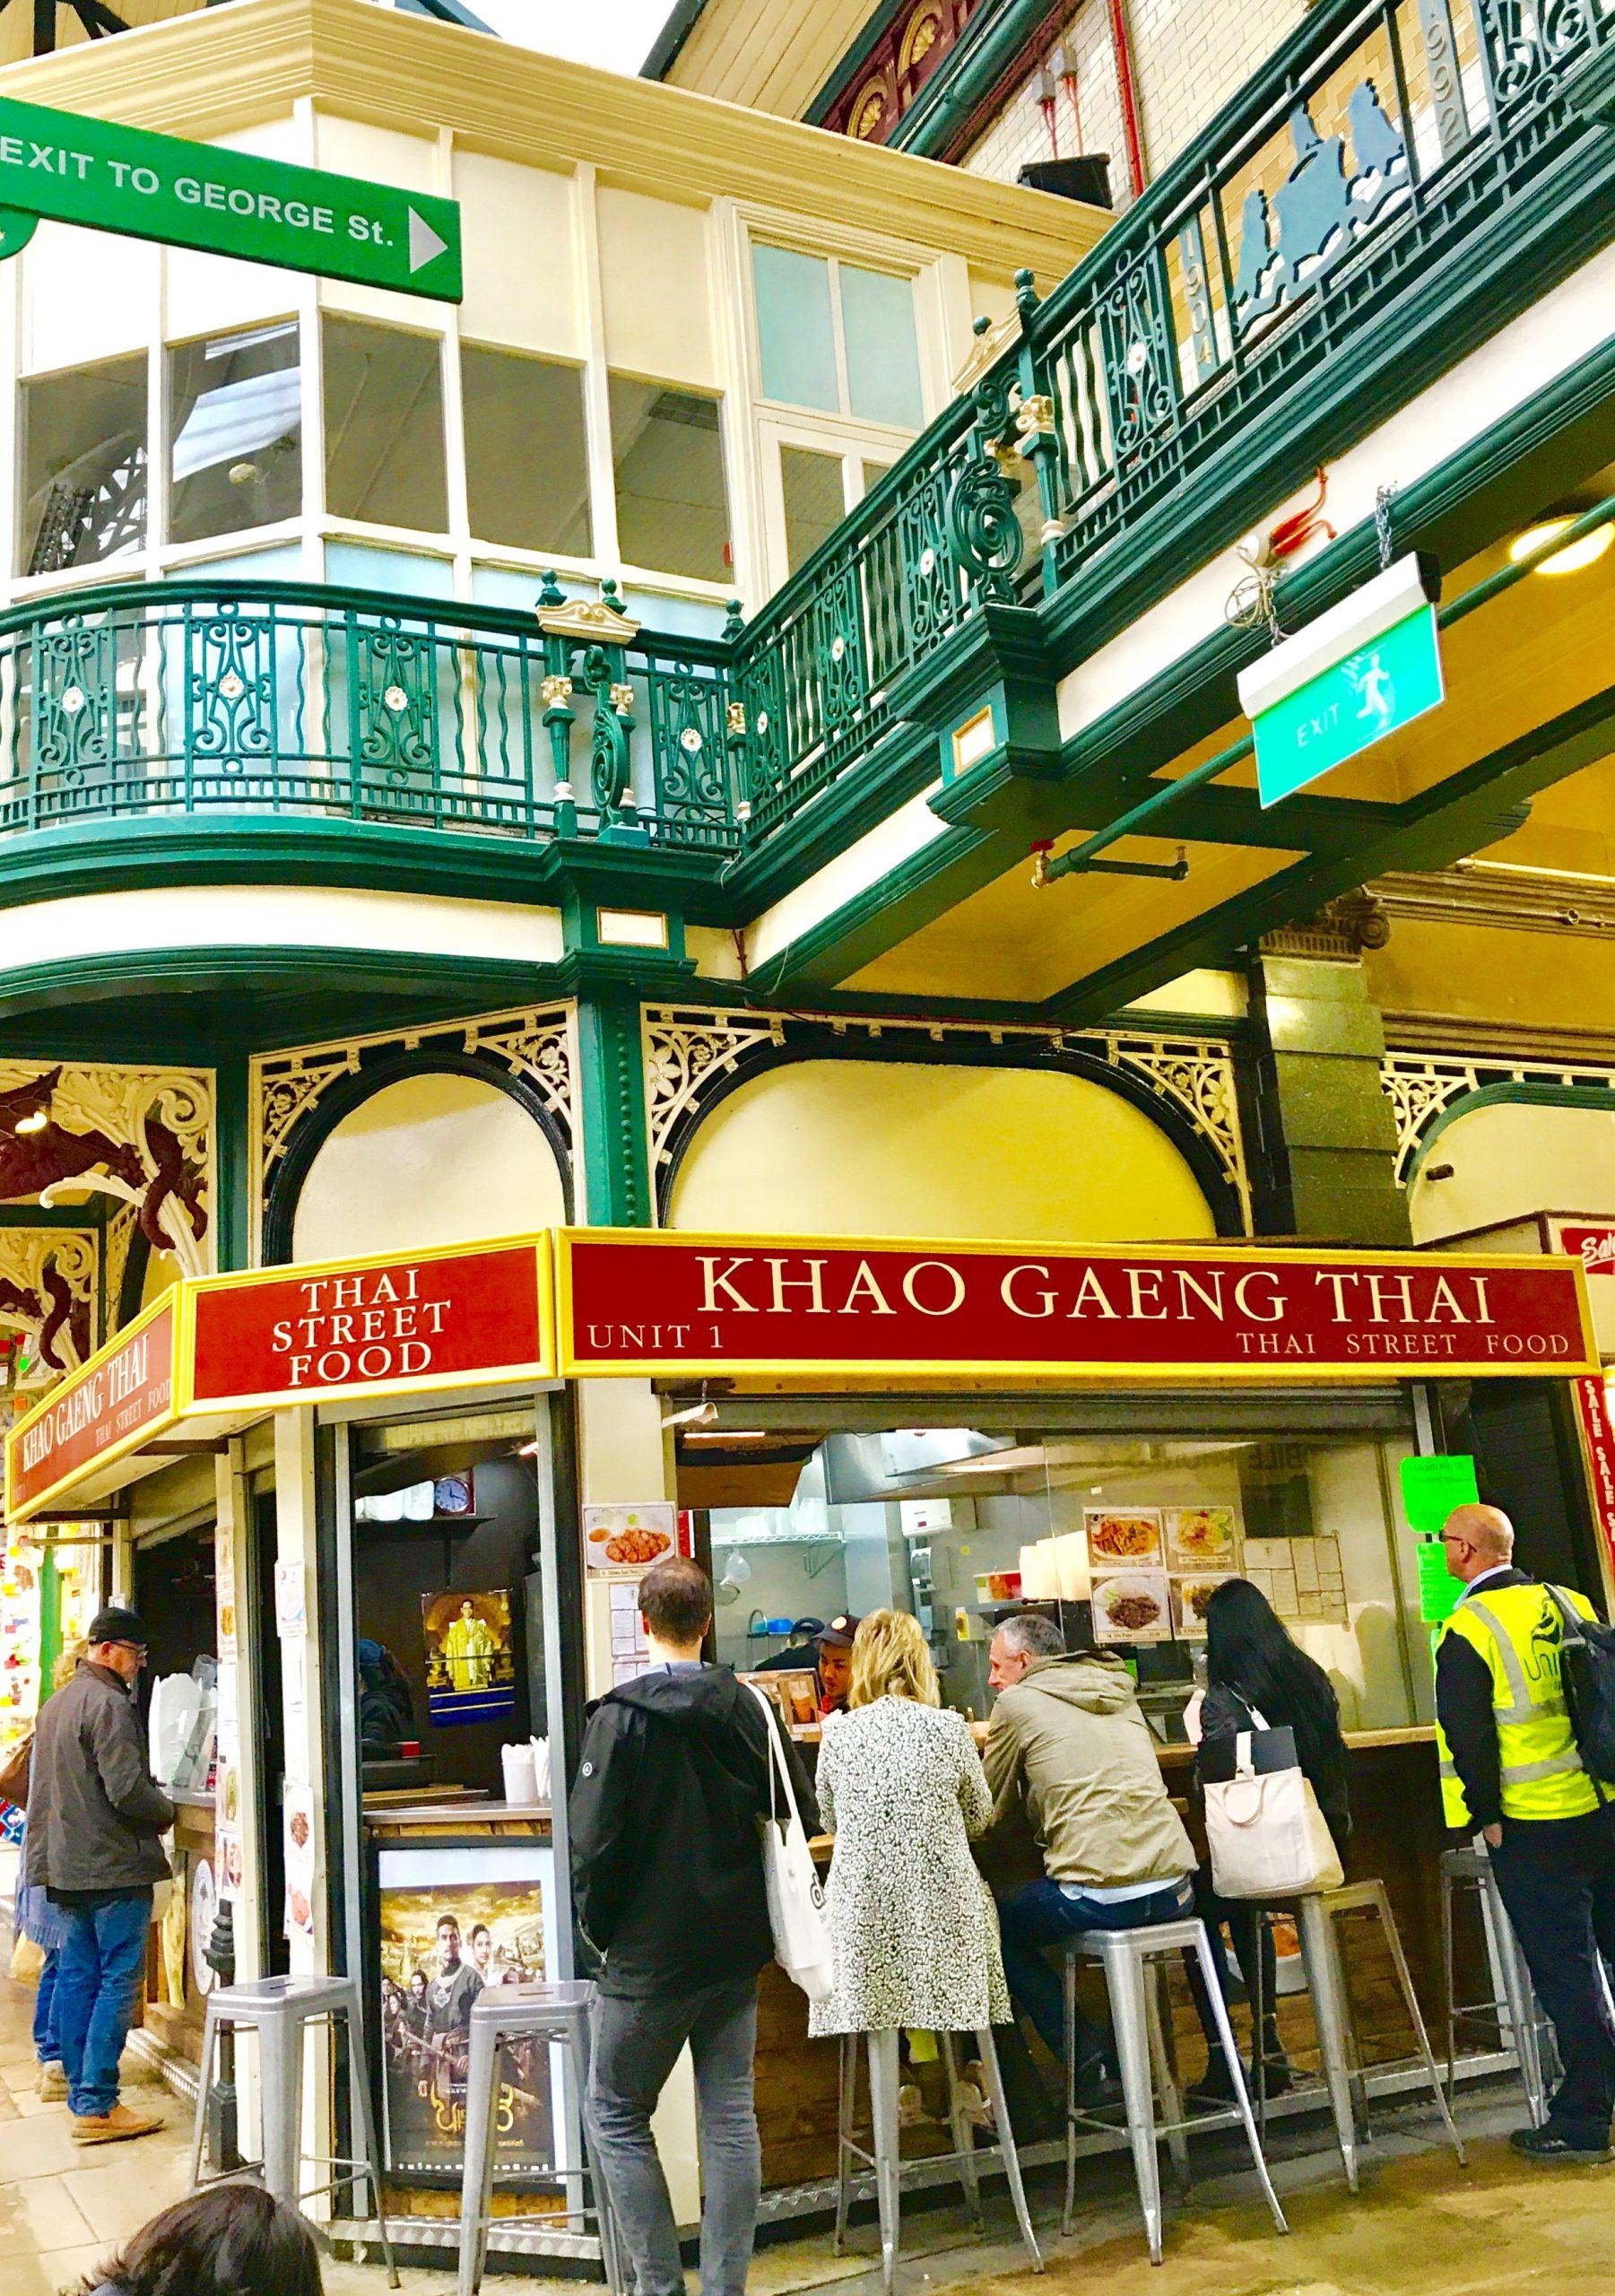 Thai food stall in Kirkgate Market Leeds